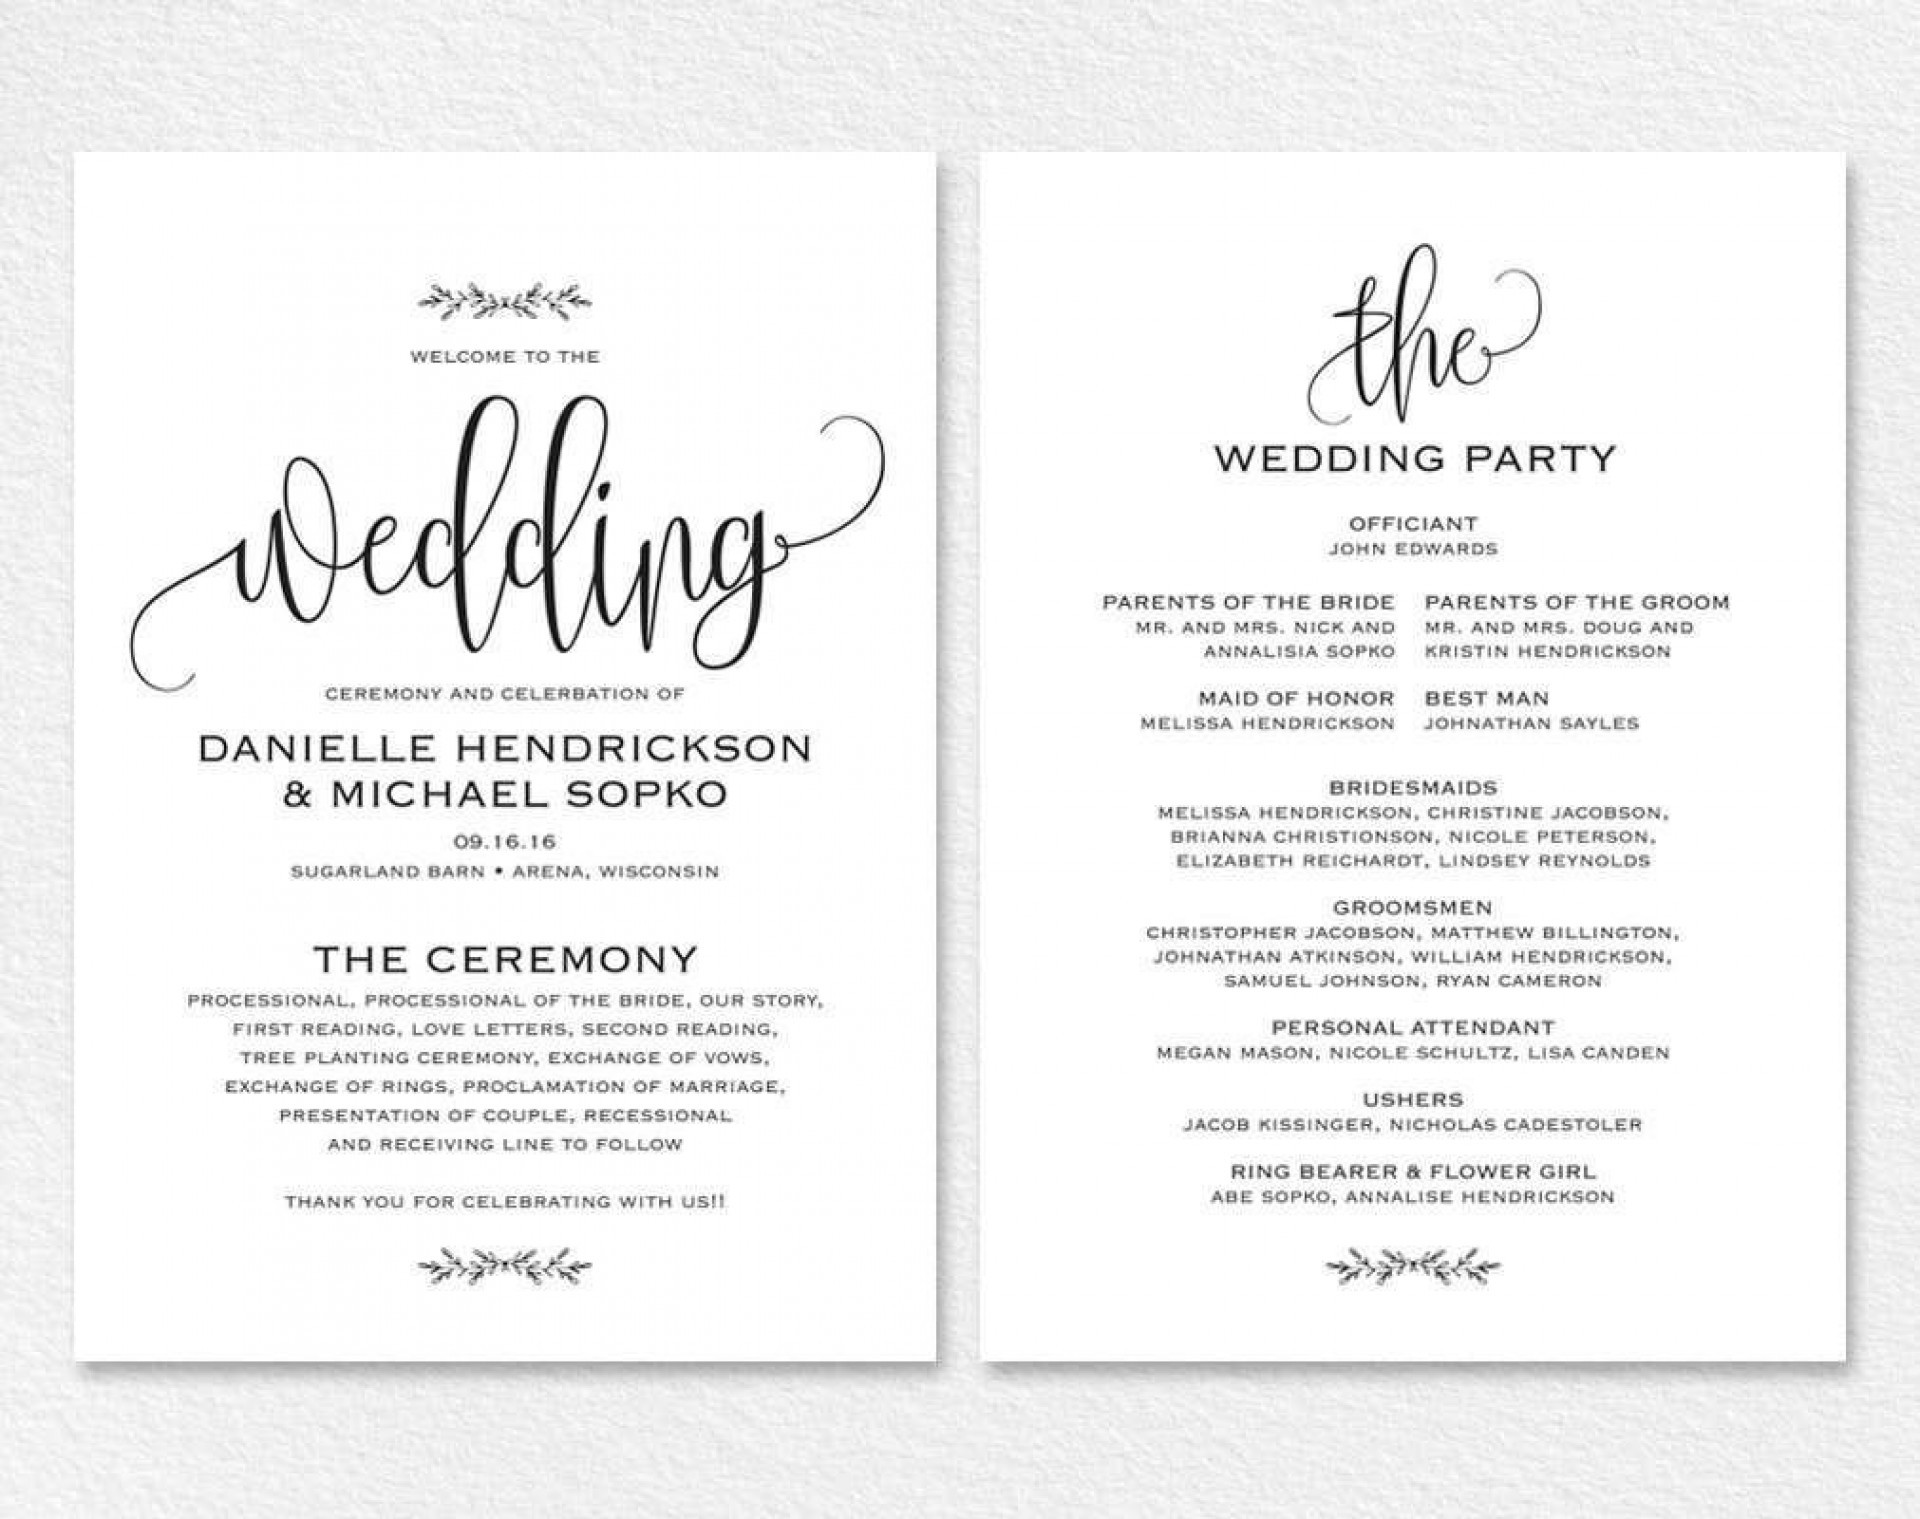 001 Awesome Free Wedding Invitation Template Printable Image  For Microsoft Word Mac1920